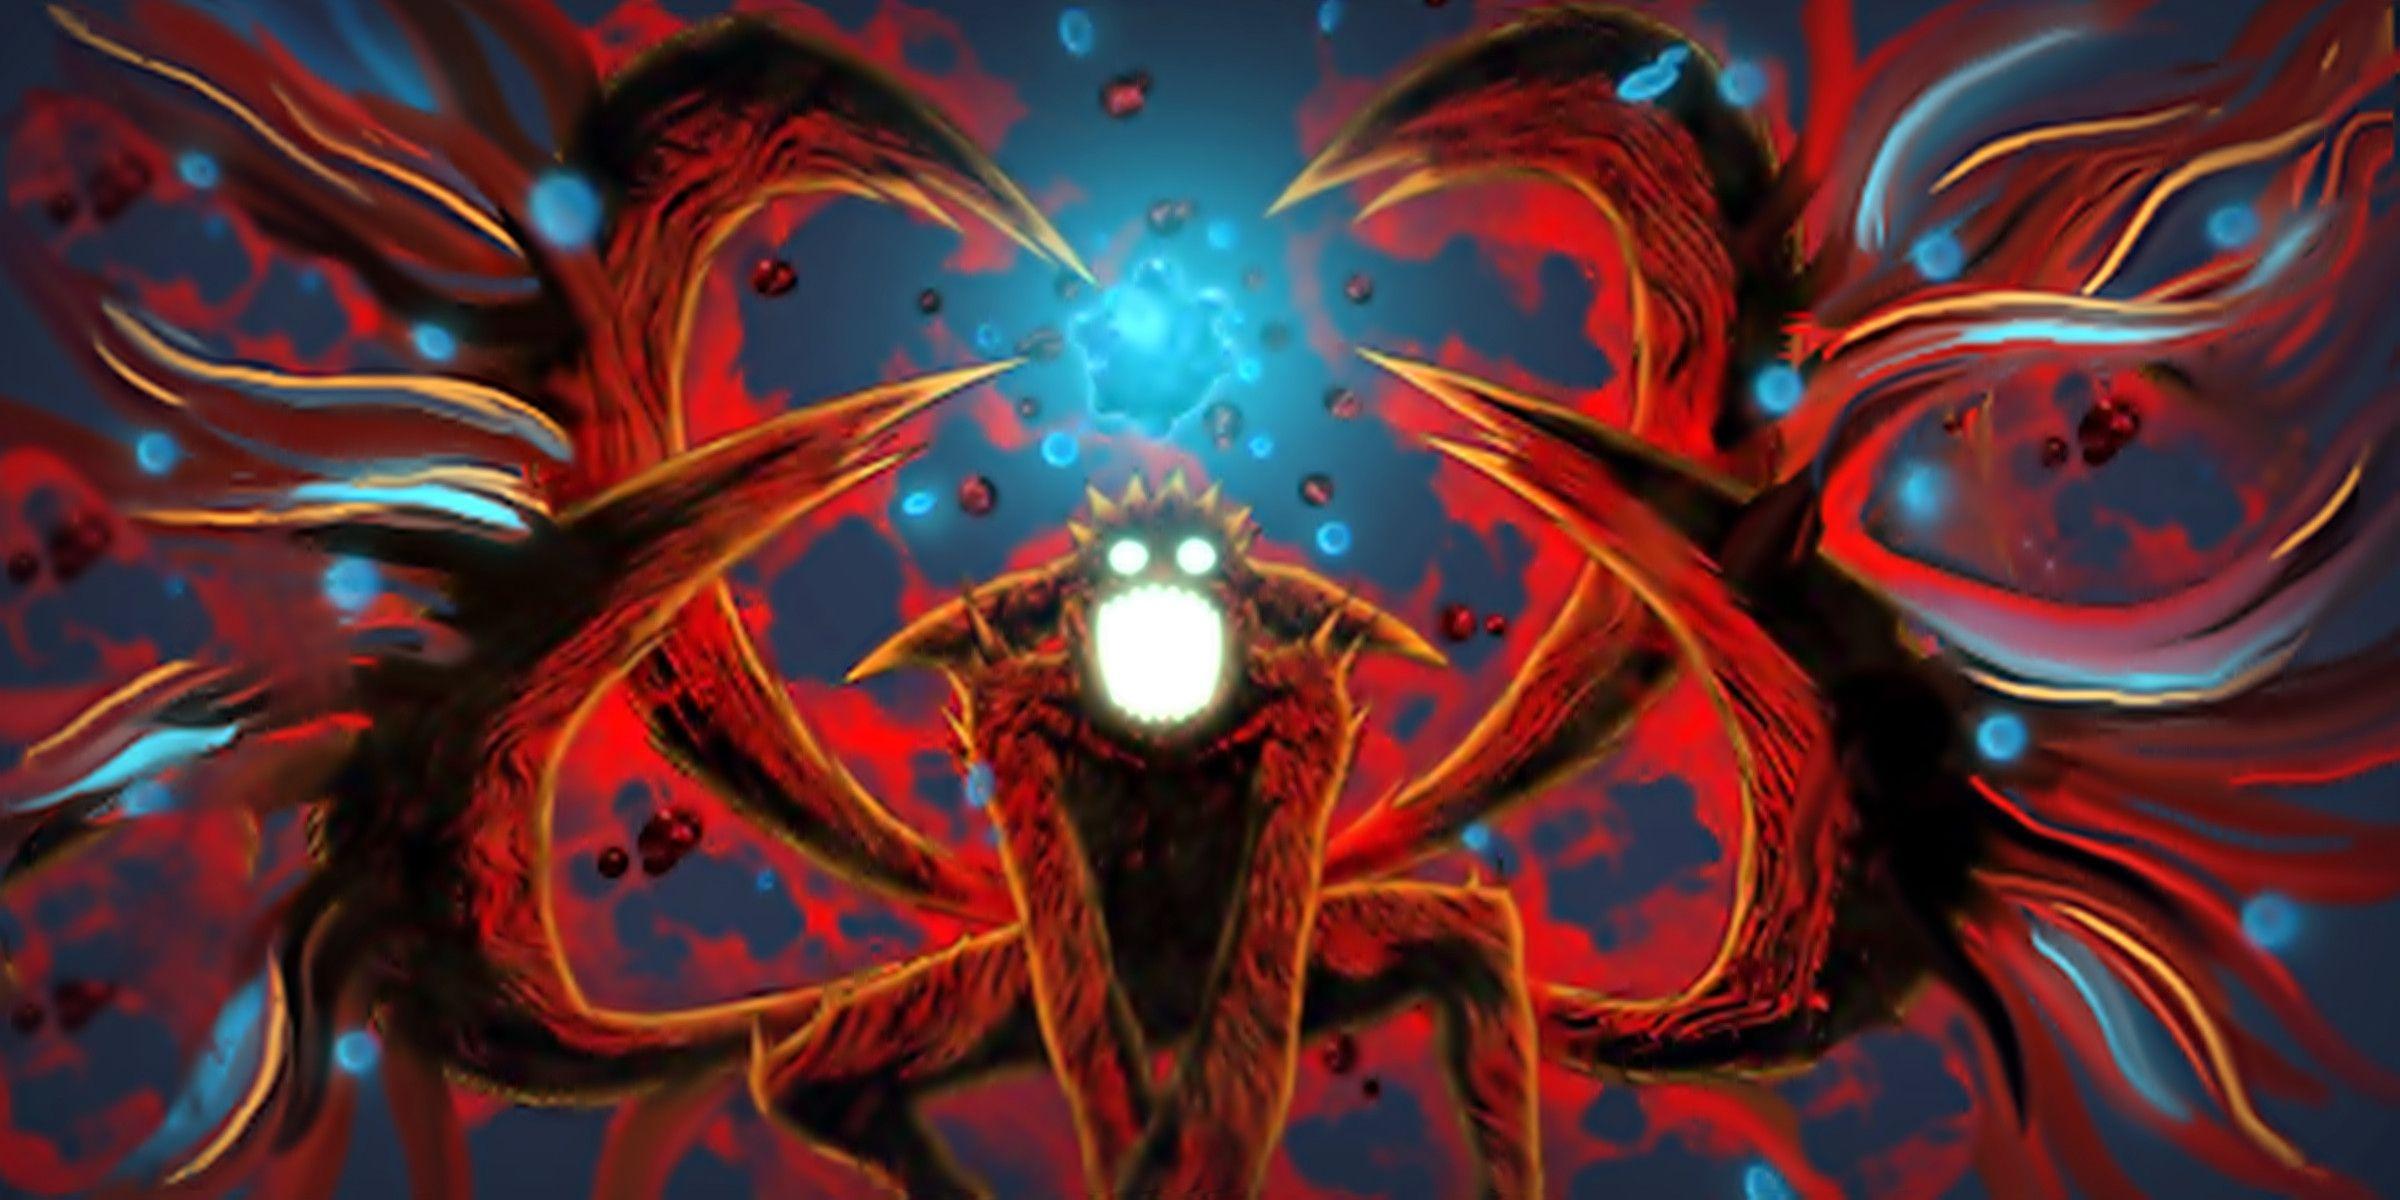 Naruto Kurama Wallpaper Posted By Christopher Tremblay